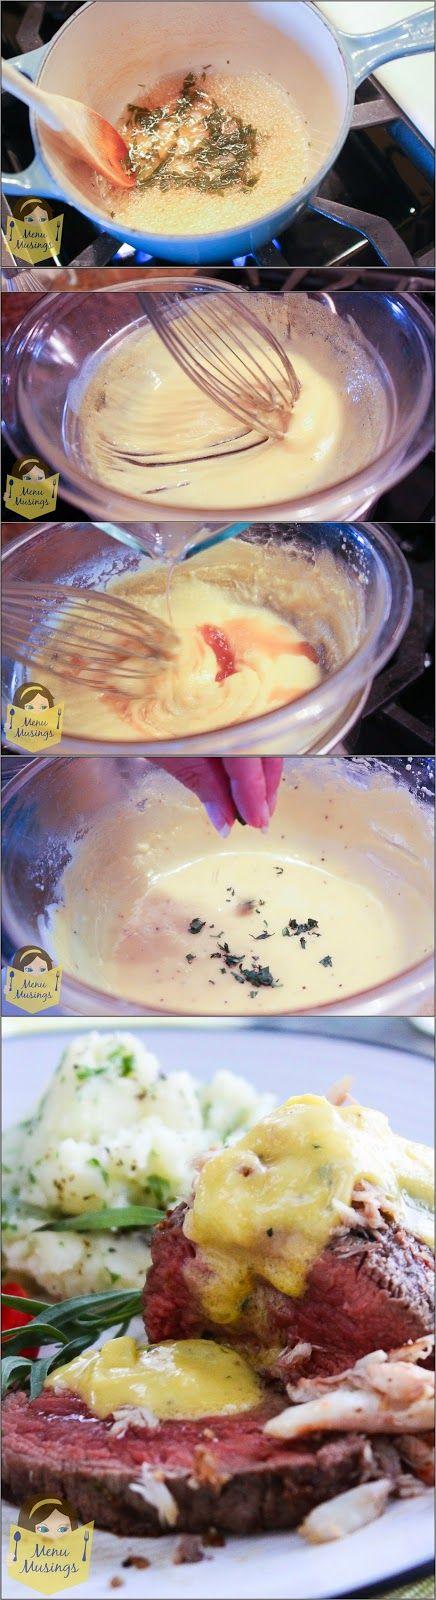 how to make bernase sauce